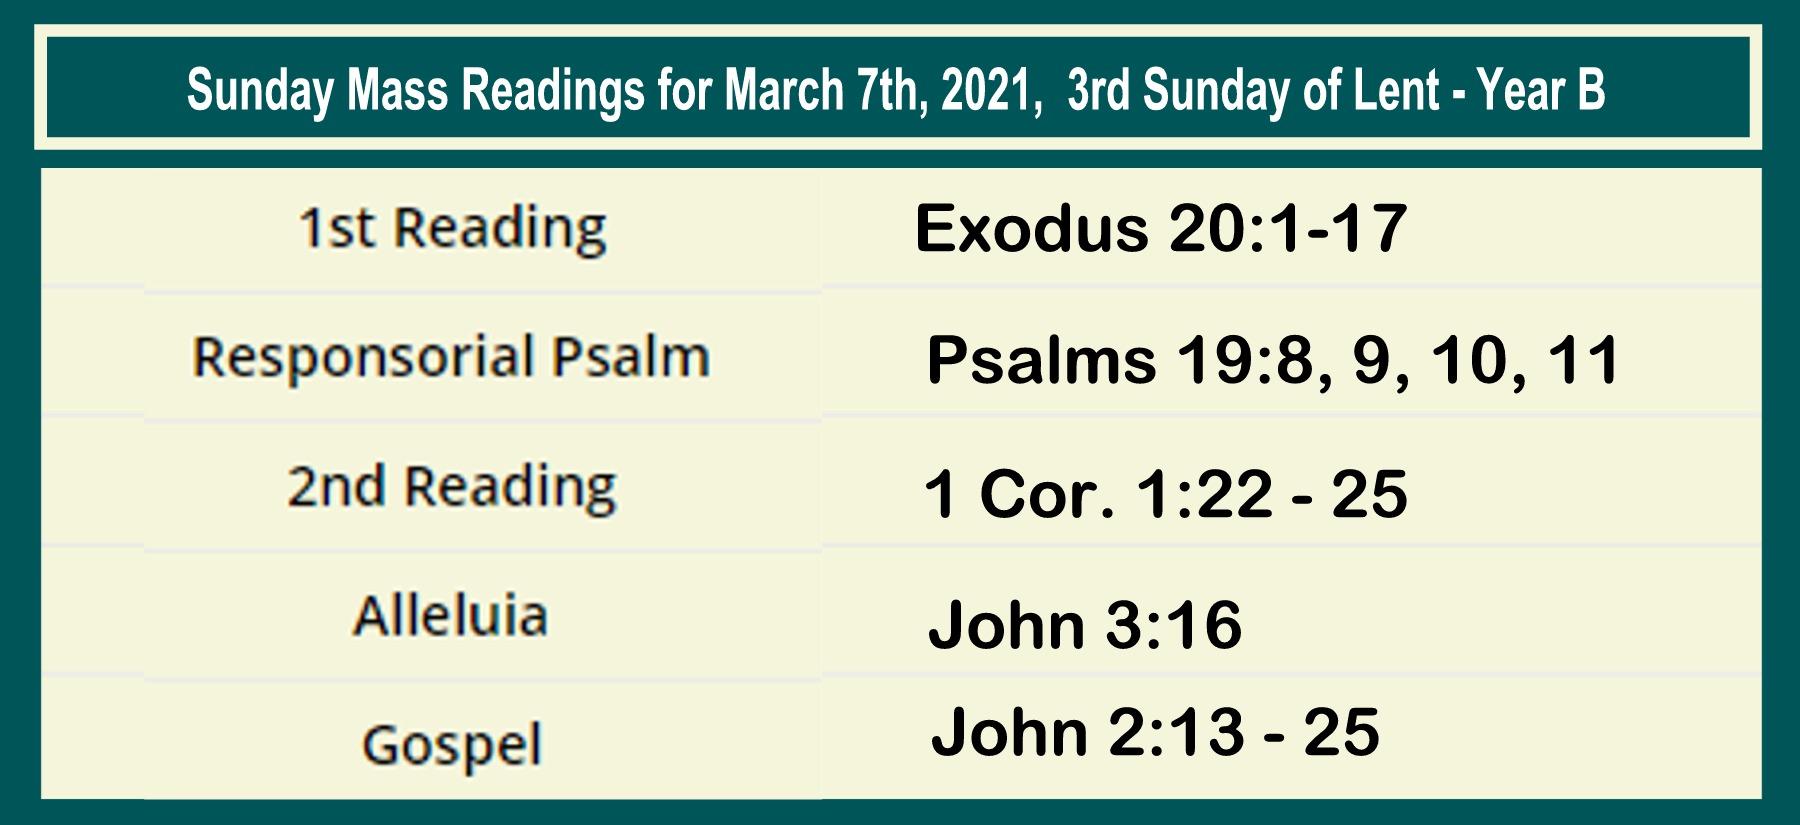 St. Louis Readings - March 07, 2021